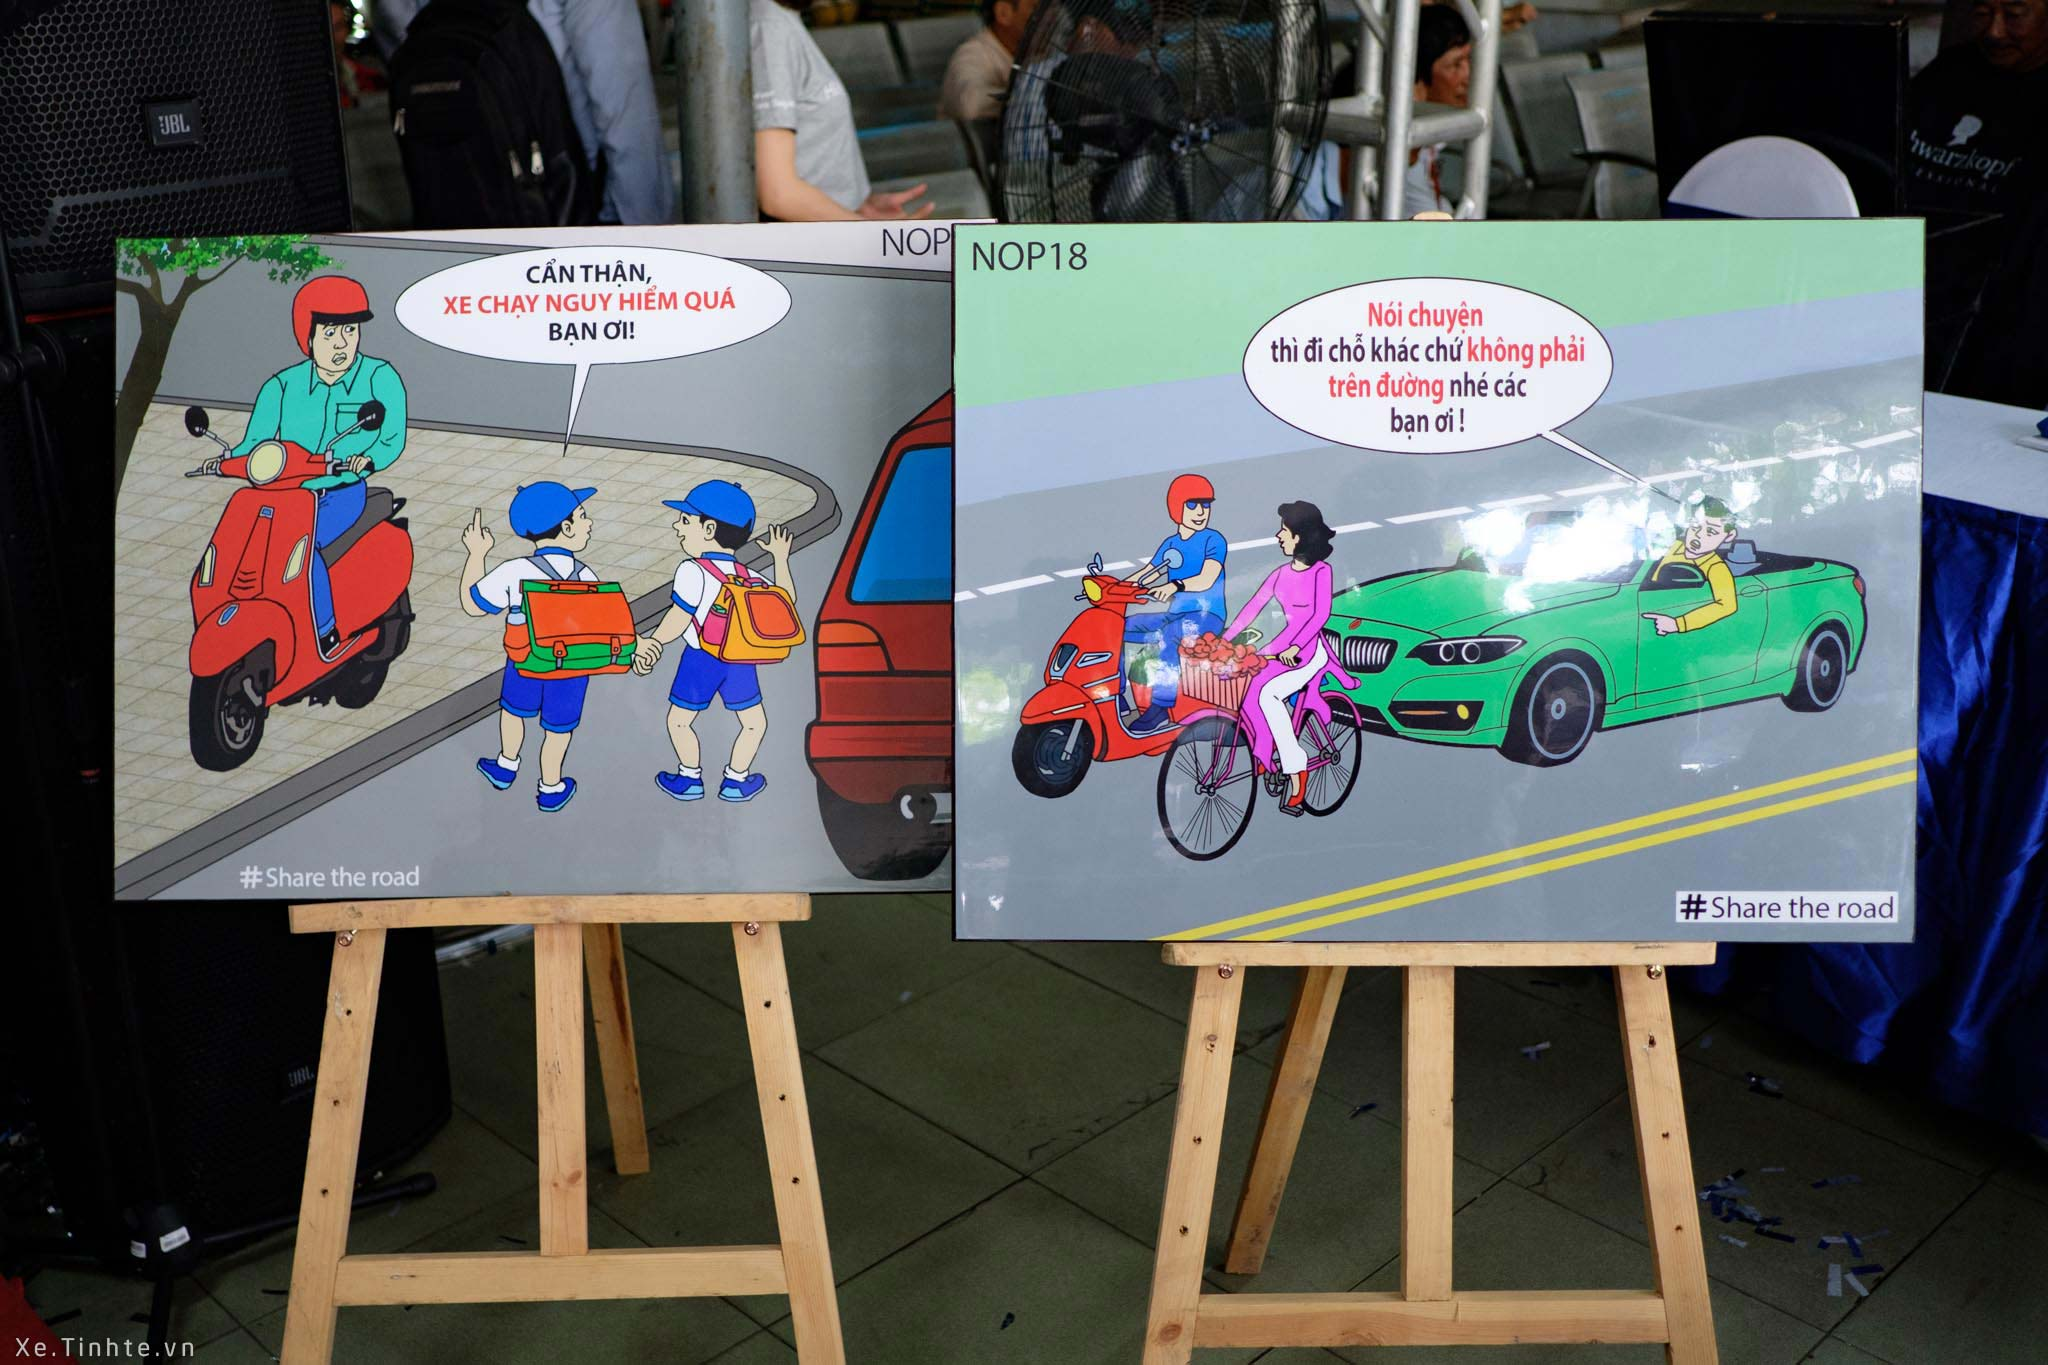 ngay-hoi_cham-soc_bac-tai_2018_driver-car-day_2018_tinhte_3.jpg